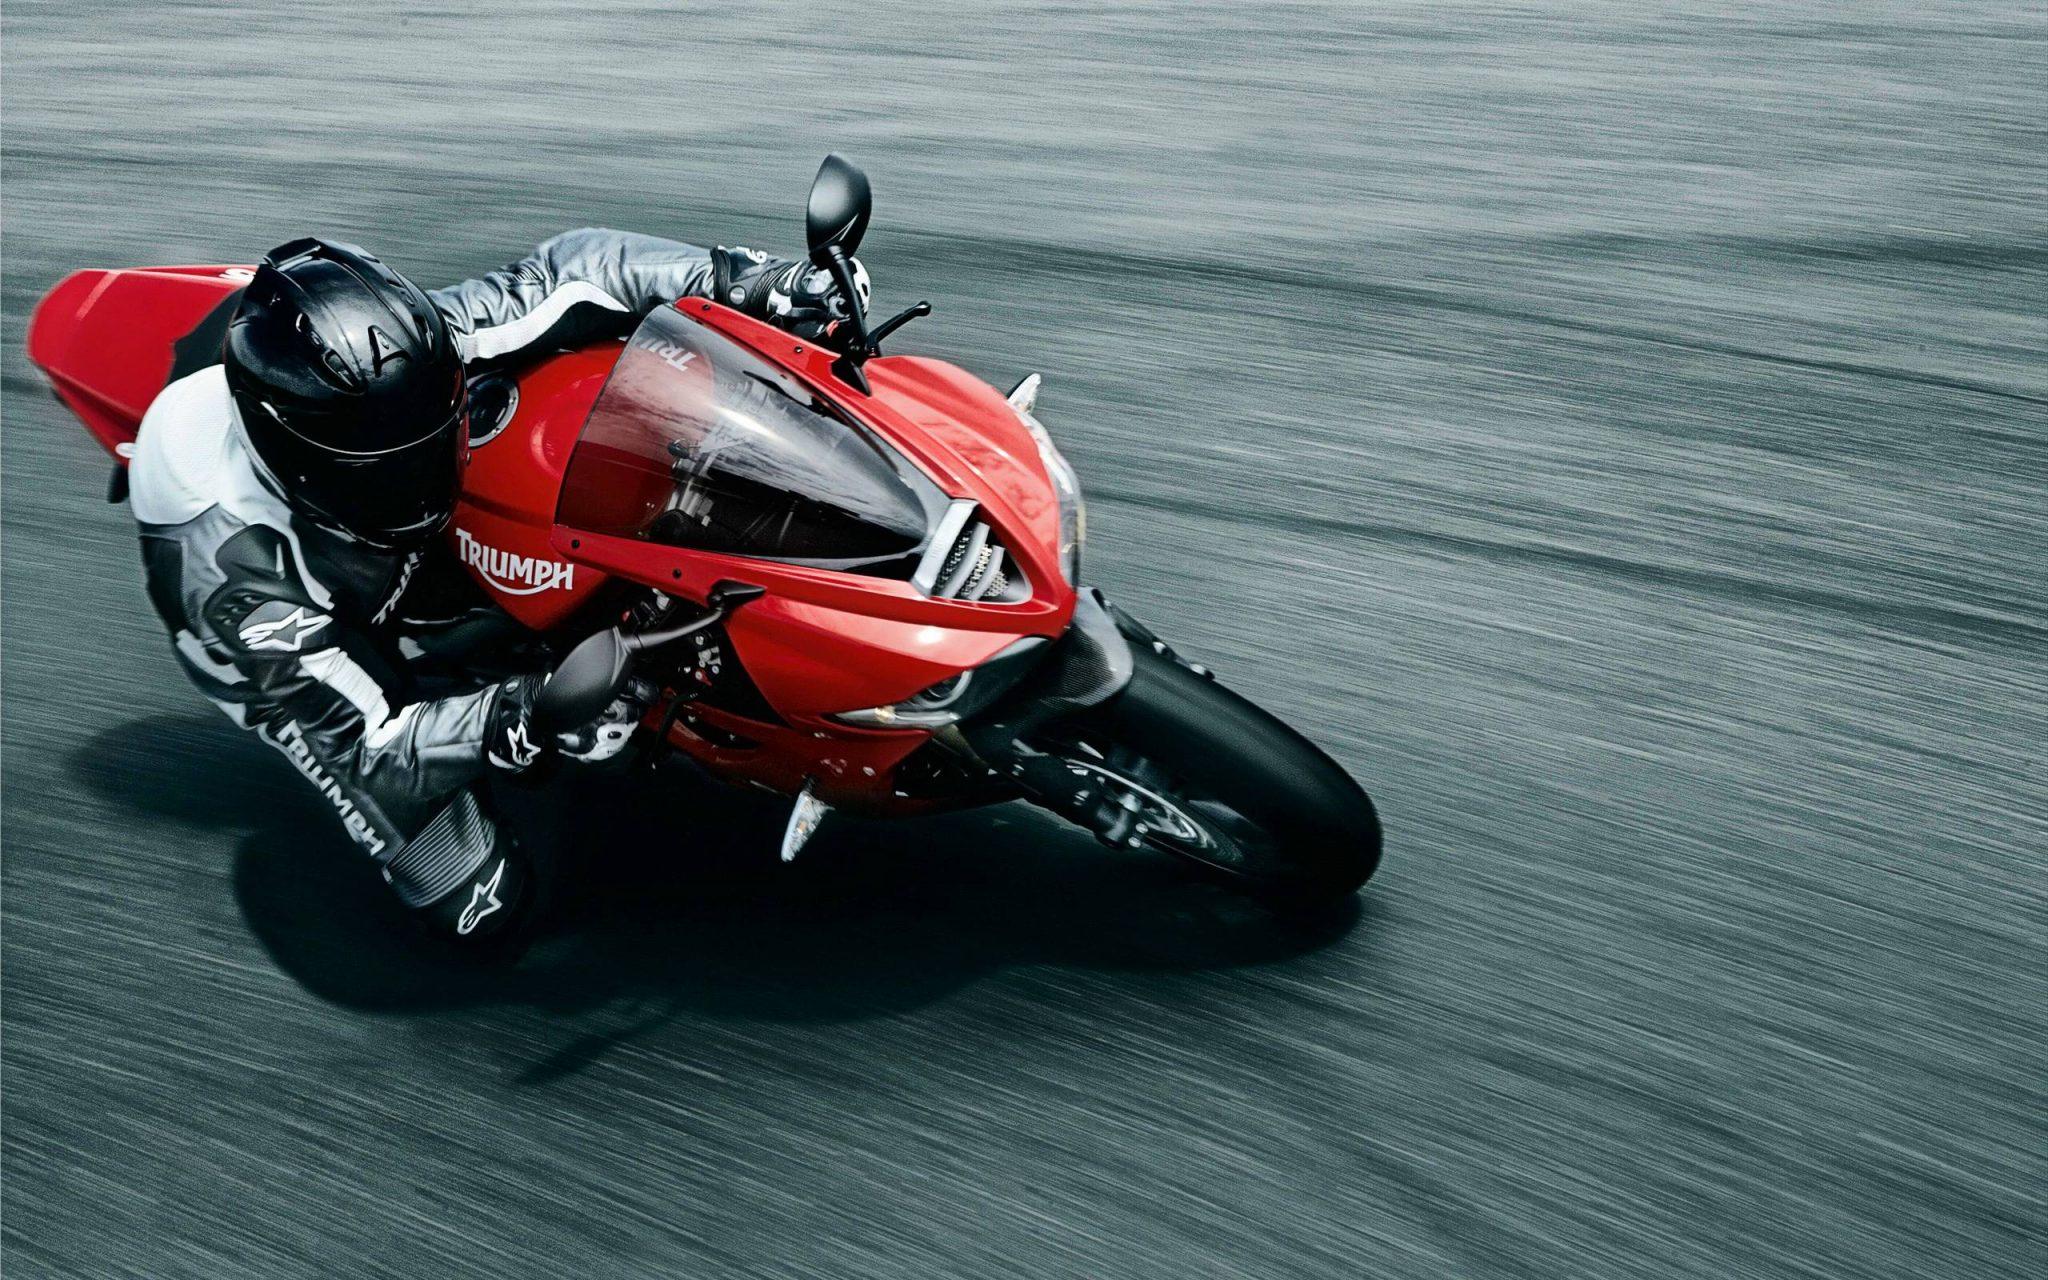 ukmoto import moto moto occasion moto anglaise moto angleterre 27 - ENQUETE SATISFACTION SUR L'ACHAT DE MOTO ANGLAISE UKMOTO IMPORT